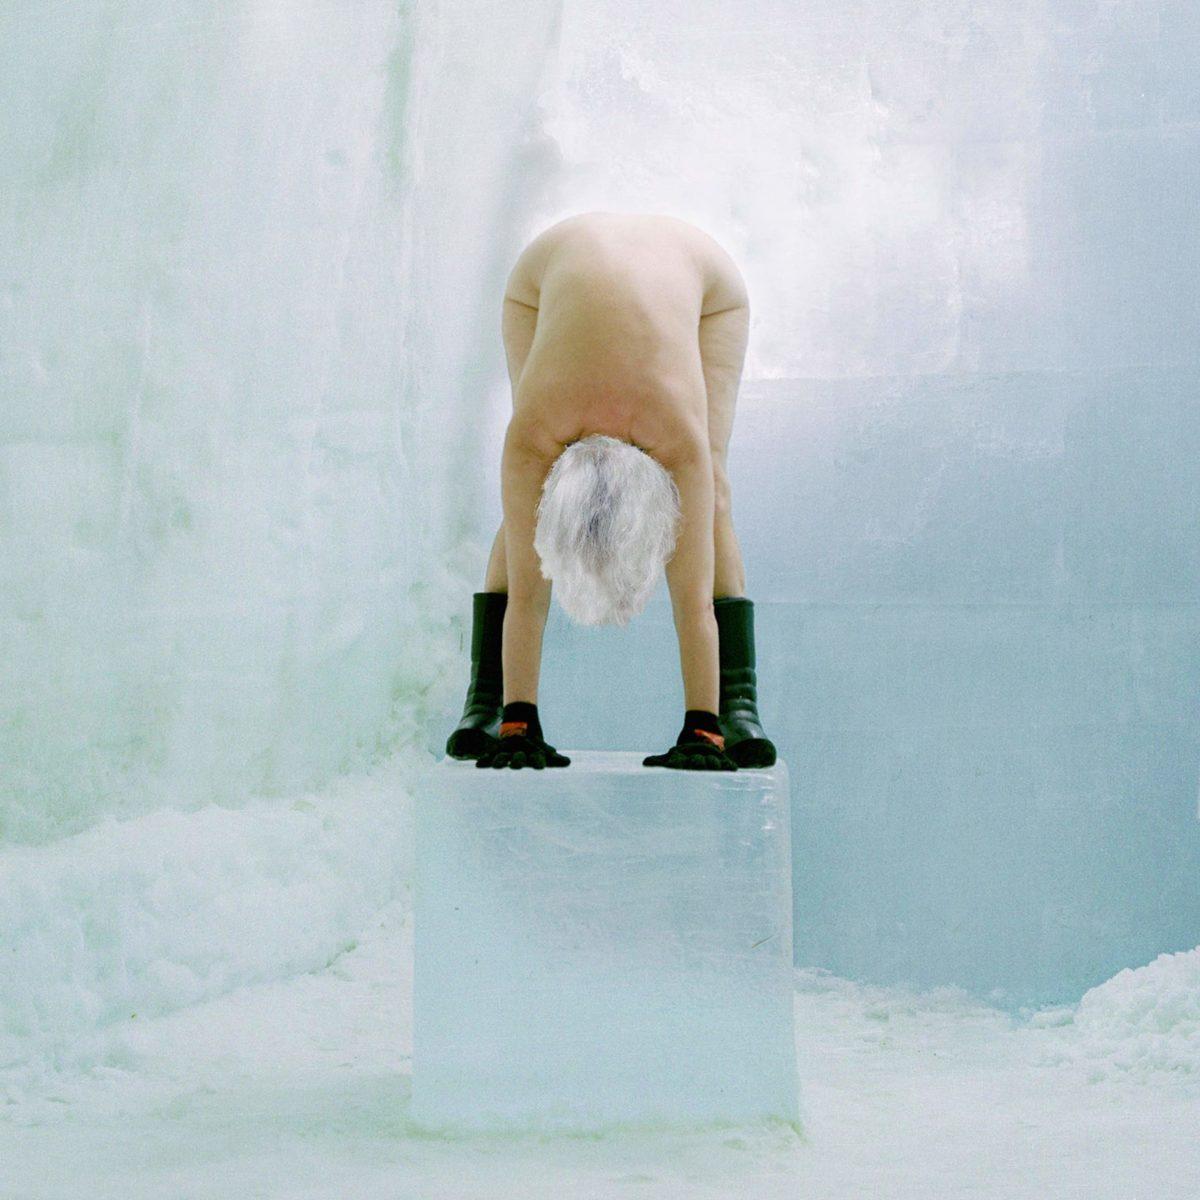 Kirsten Justesen, Ice Pedestal, Formations, 2000, © Kirsten Justesen